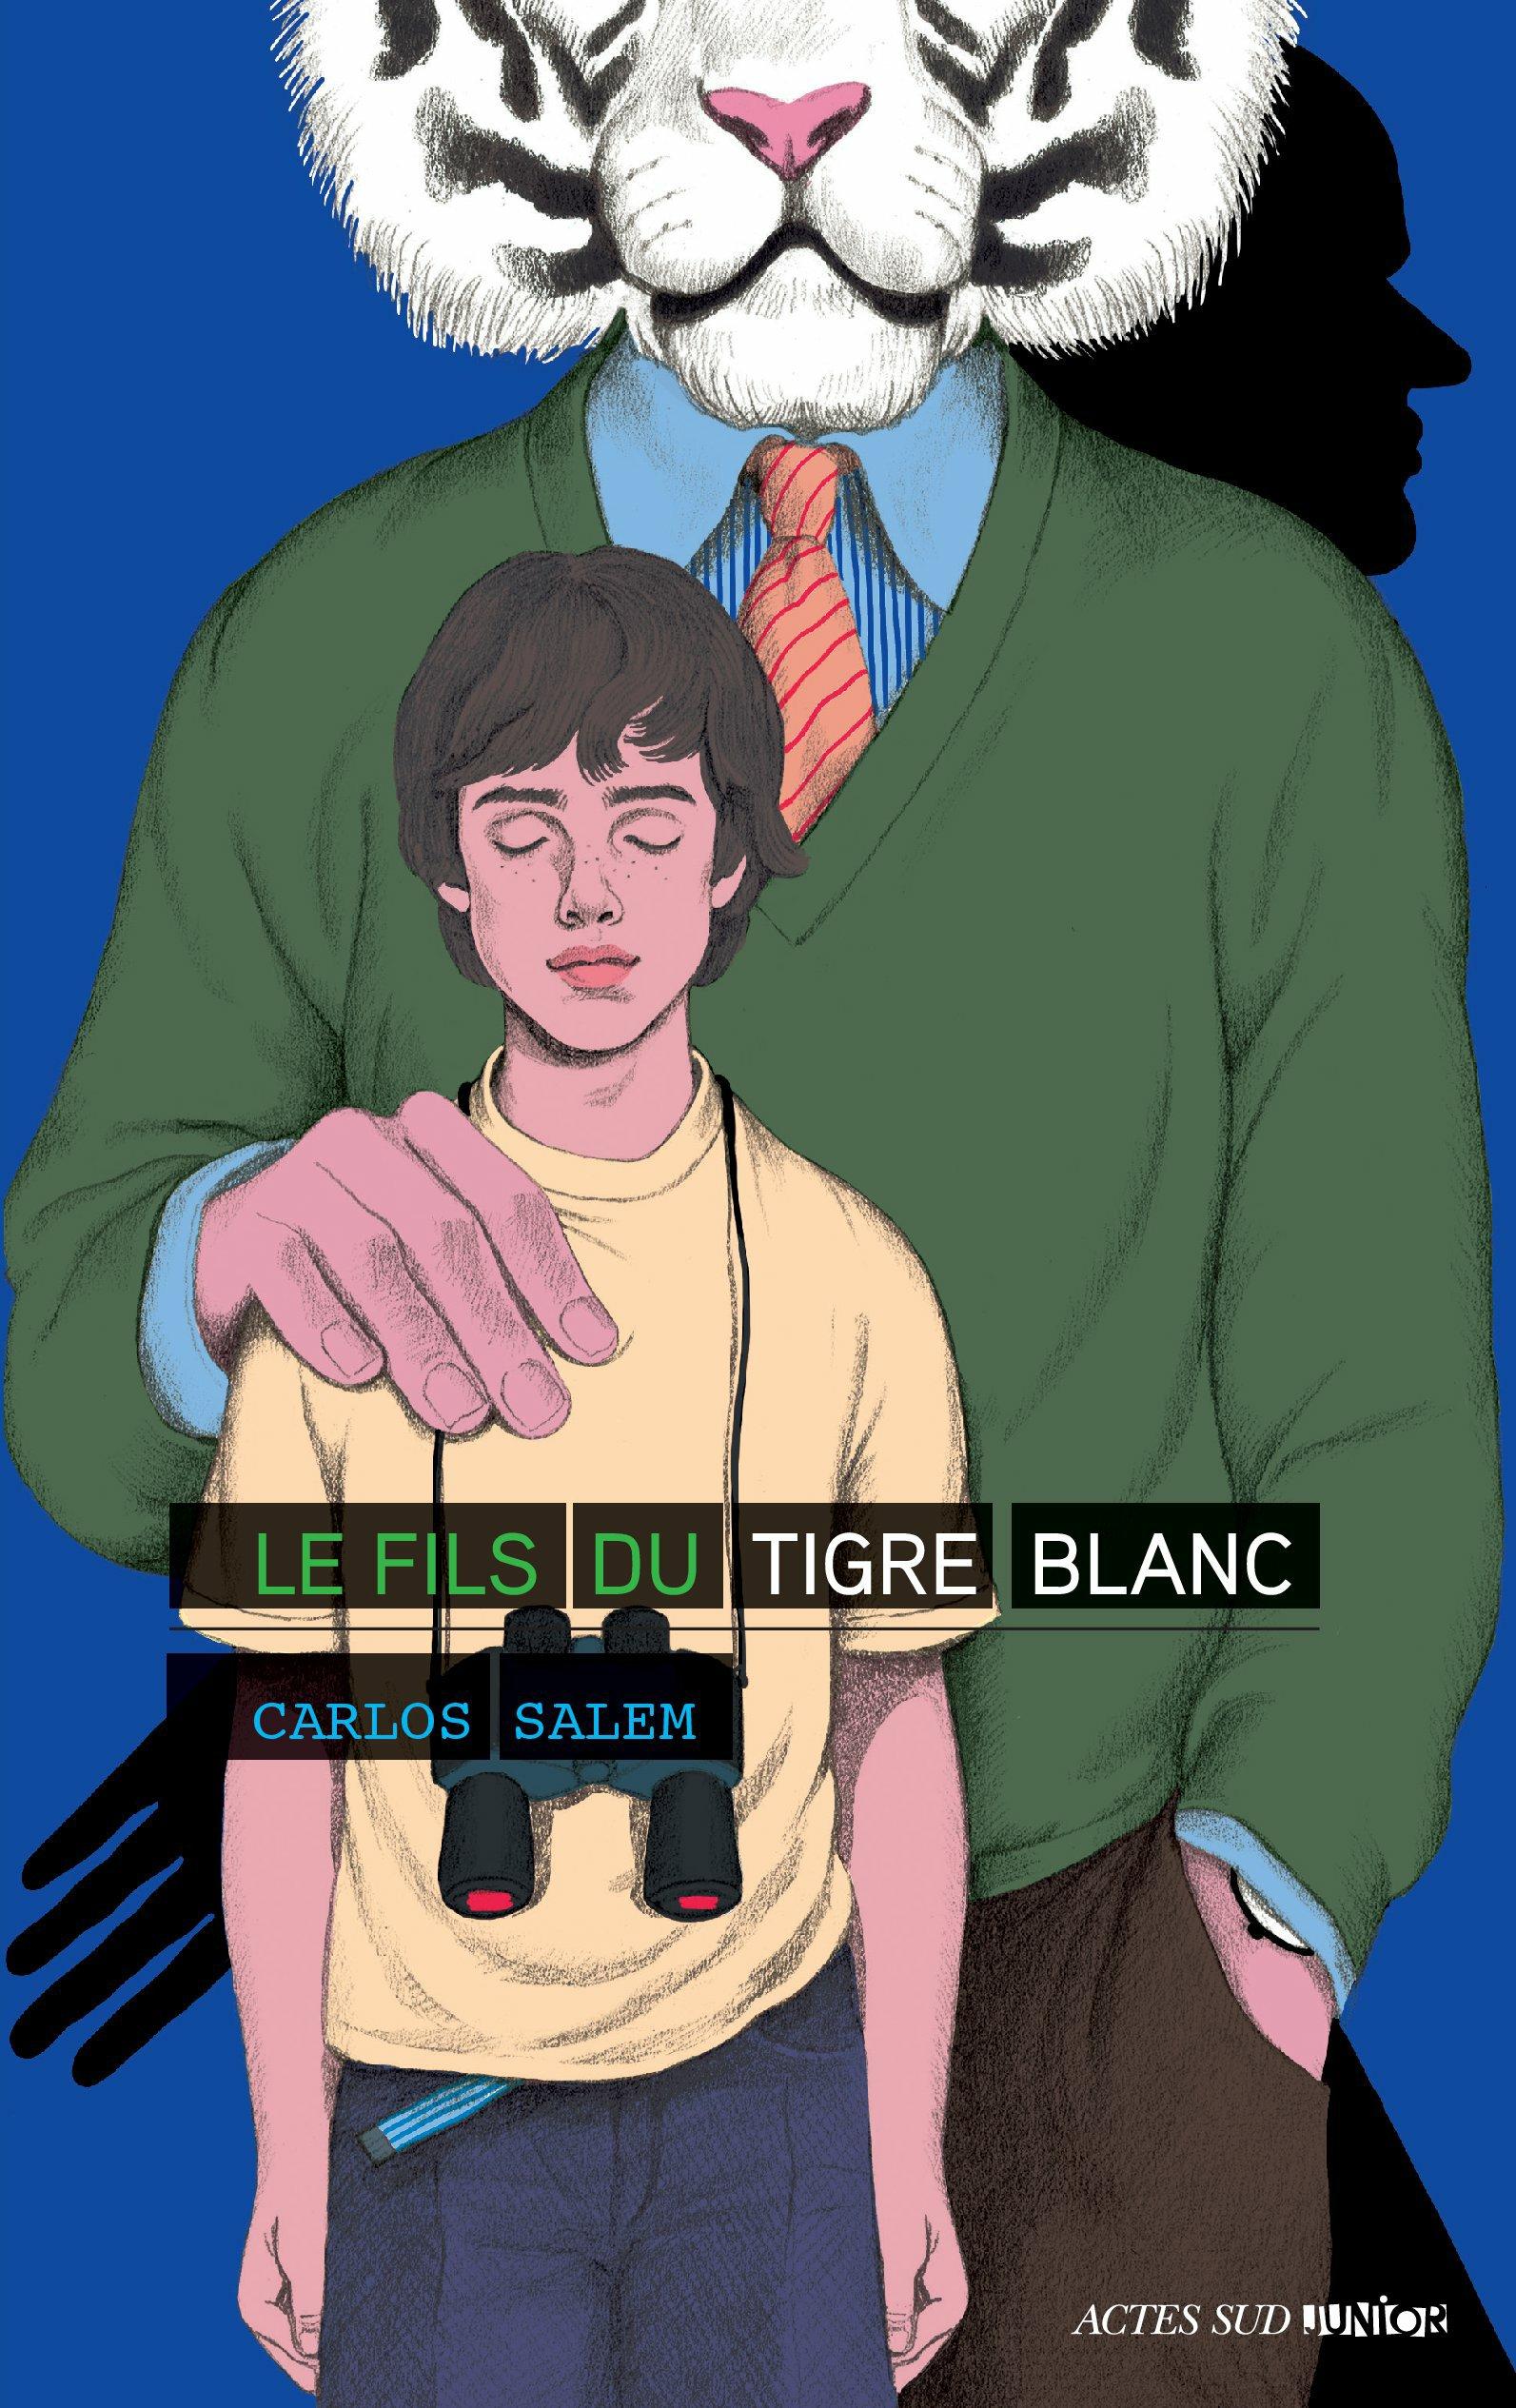 Le fils du Tigre Blanc